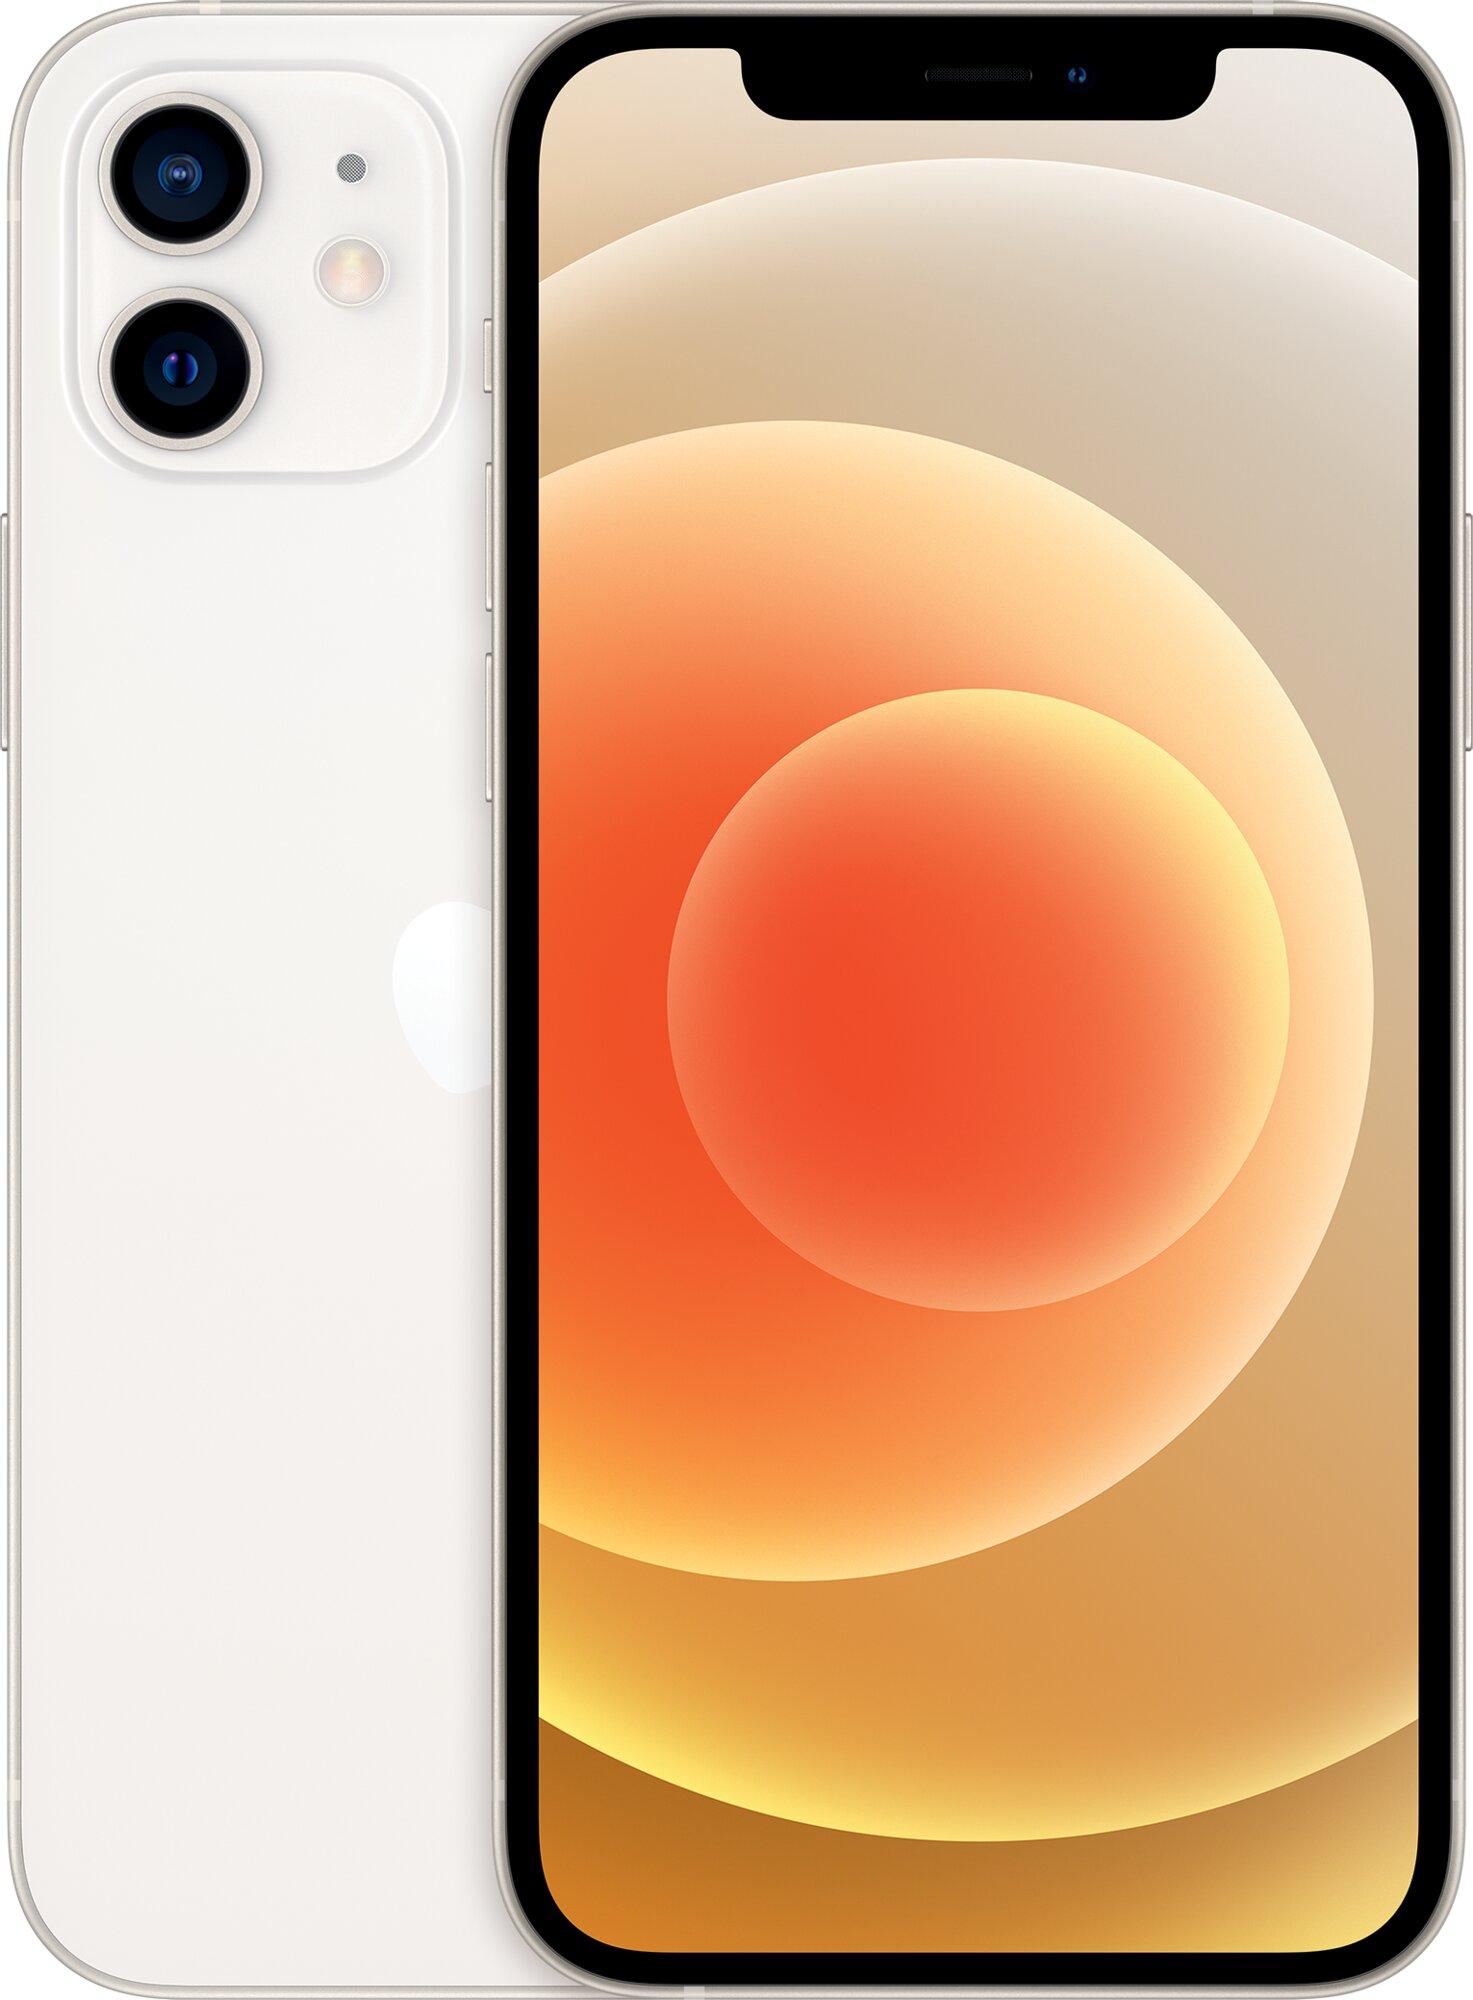 Apple iPhone 12, 64GB White